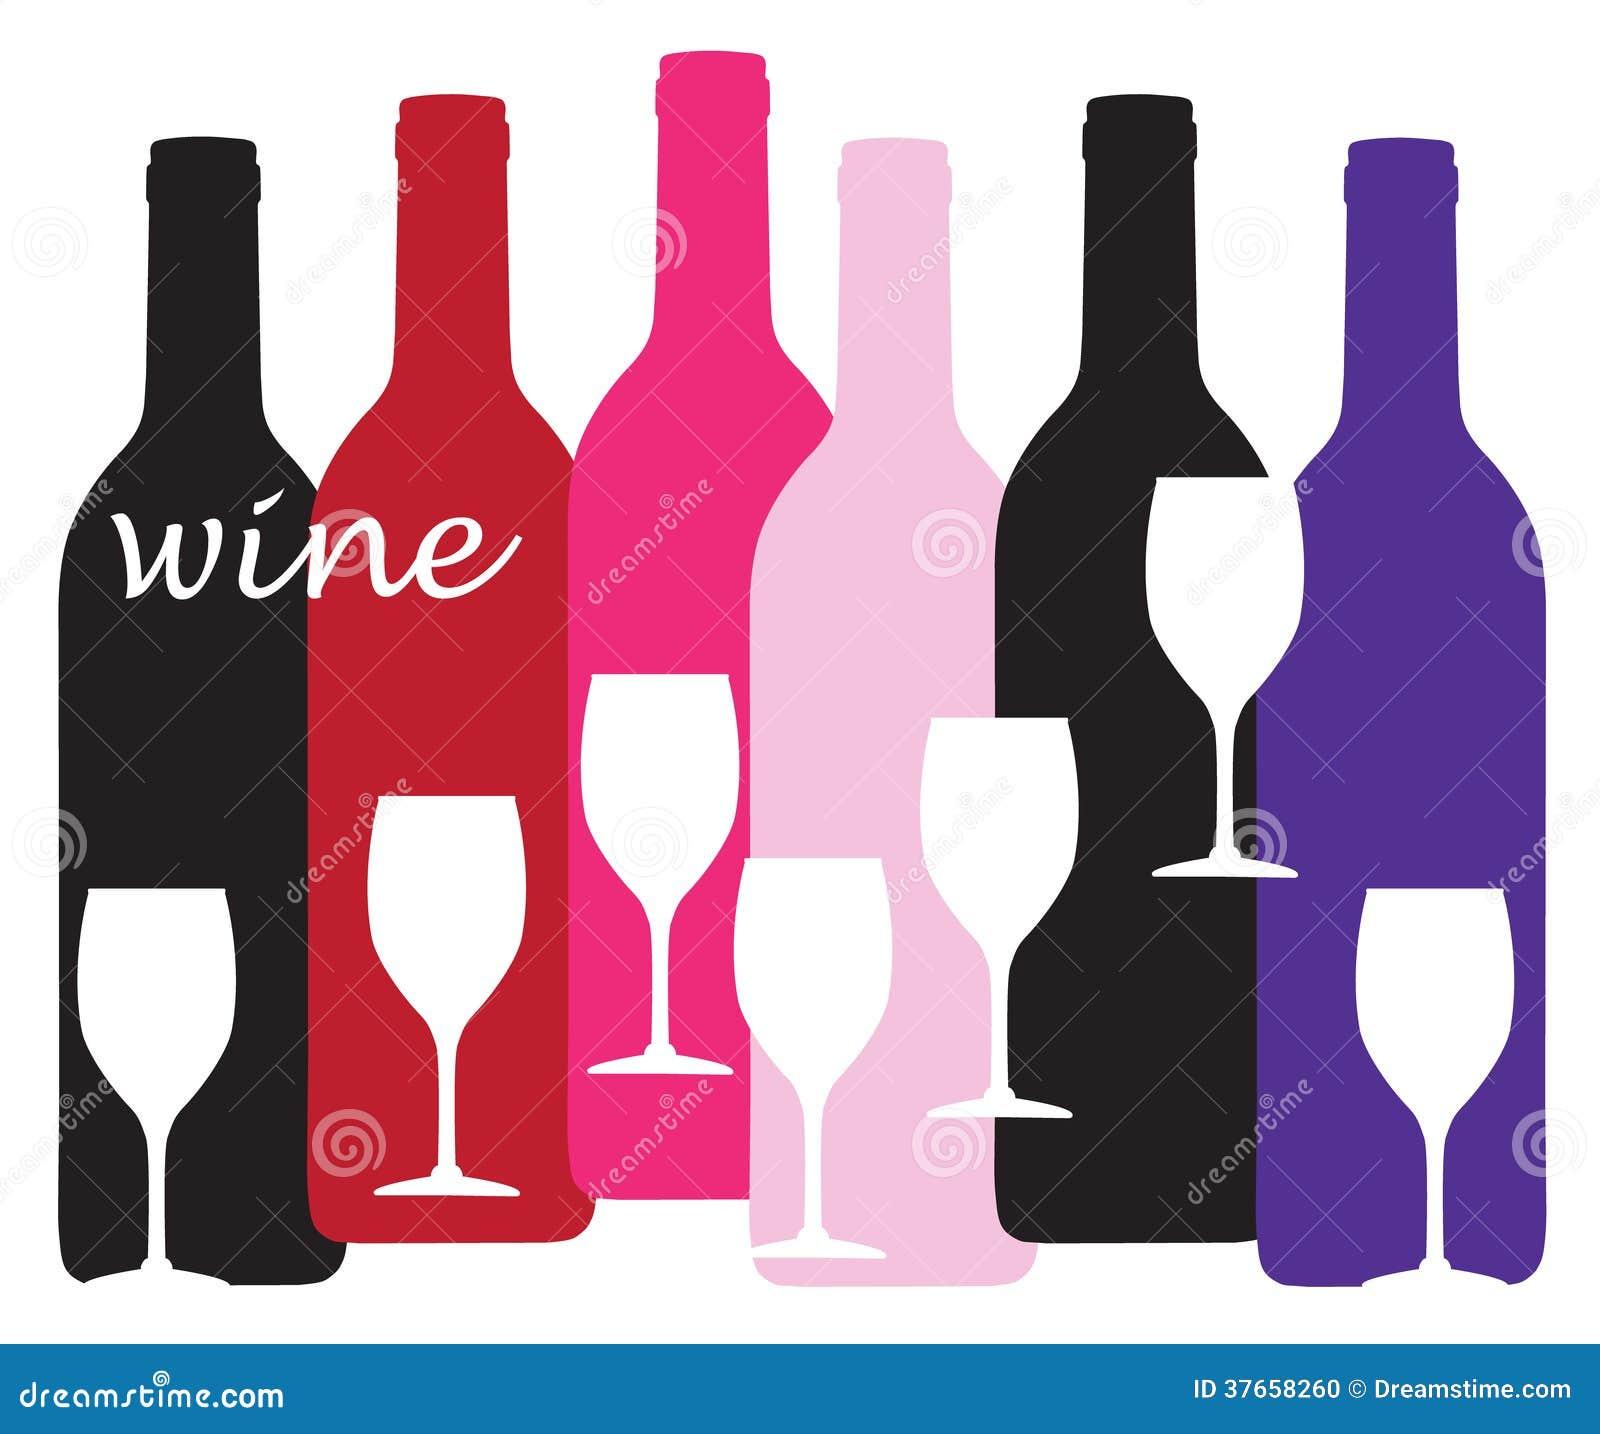 Beautiful Wine Bottle Design |Wine Bottle Graphic Design